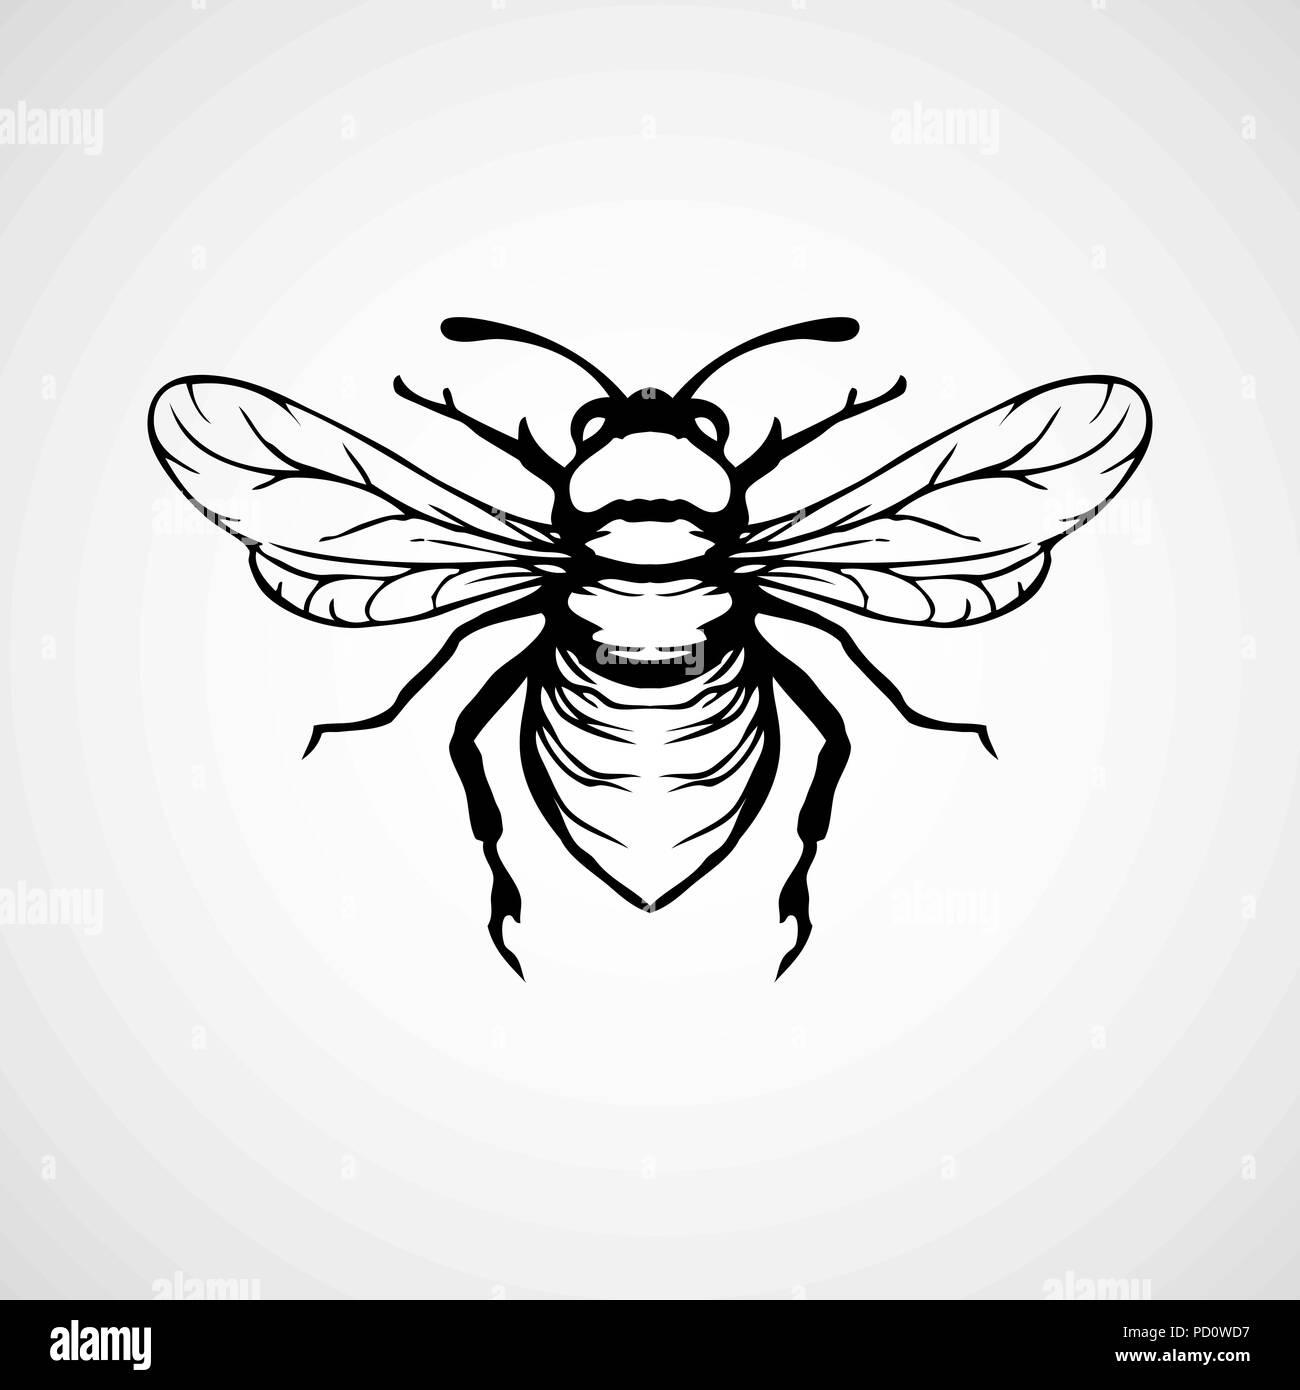 Vector engraving illustration of honey bee on white background - Stock Image